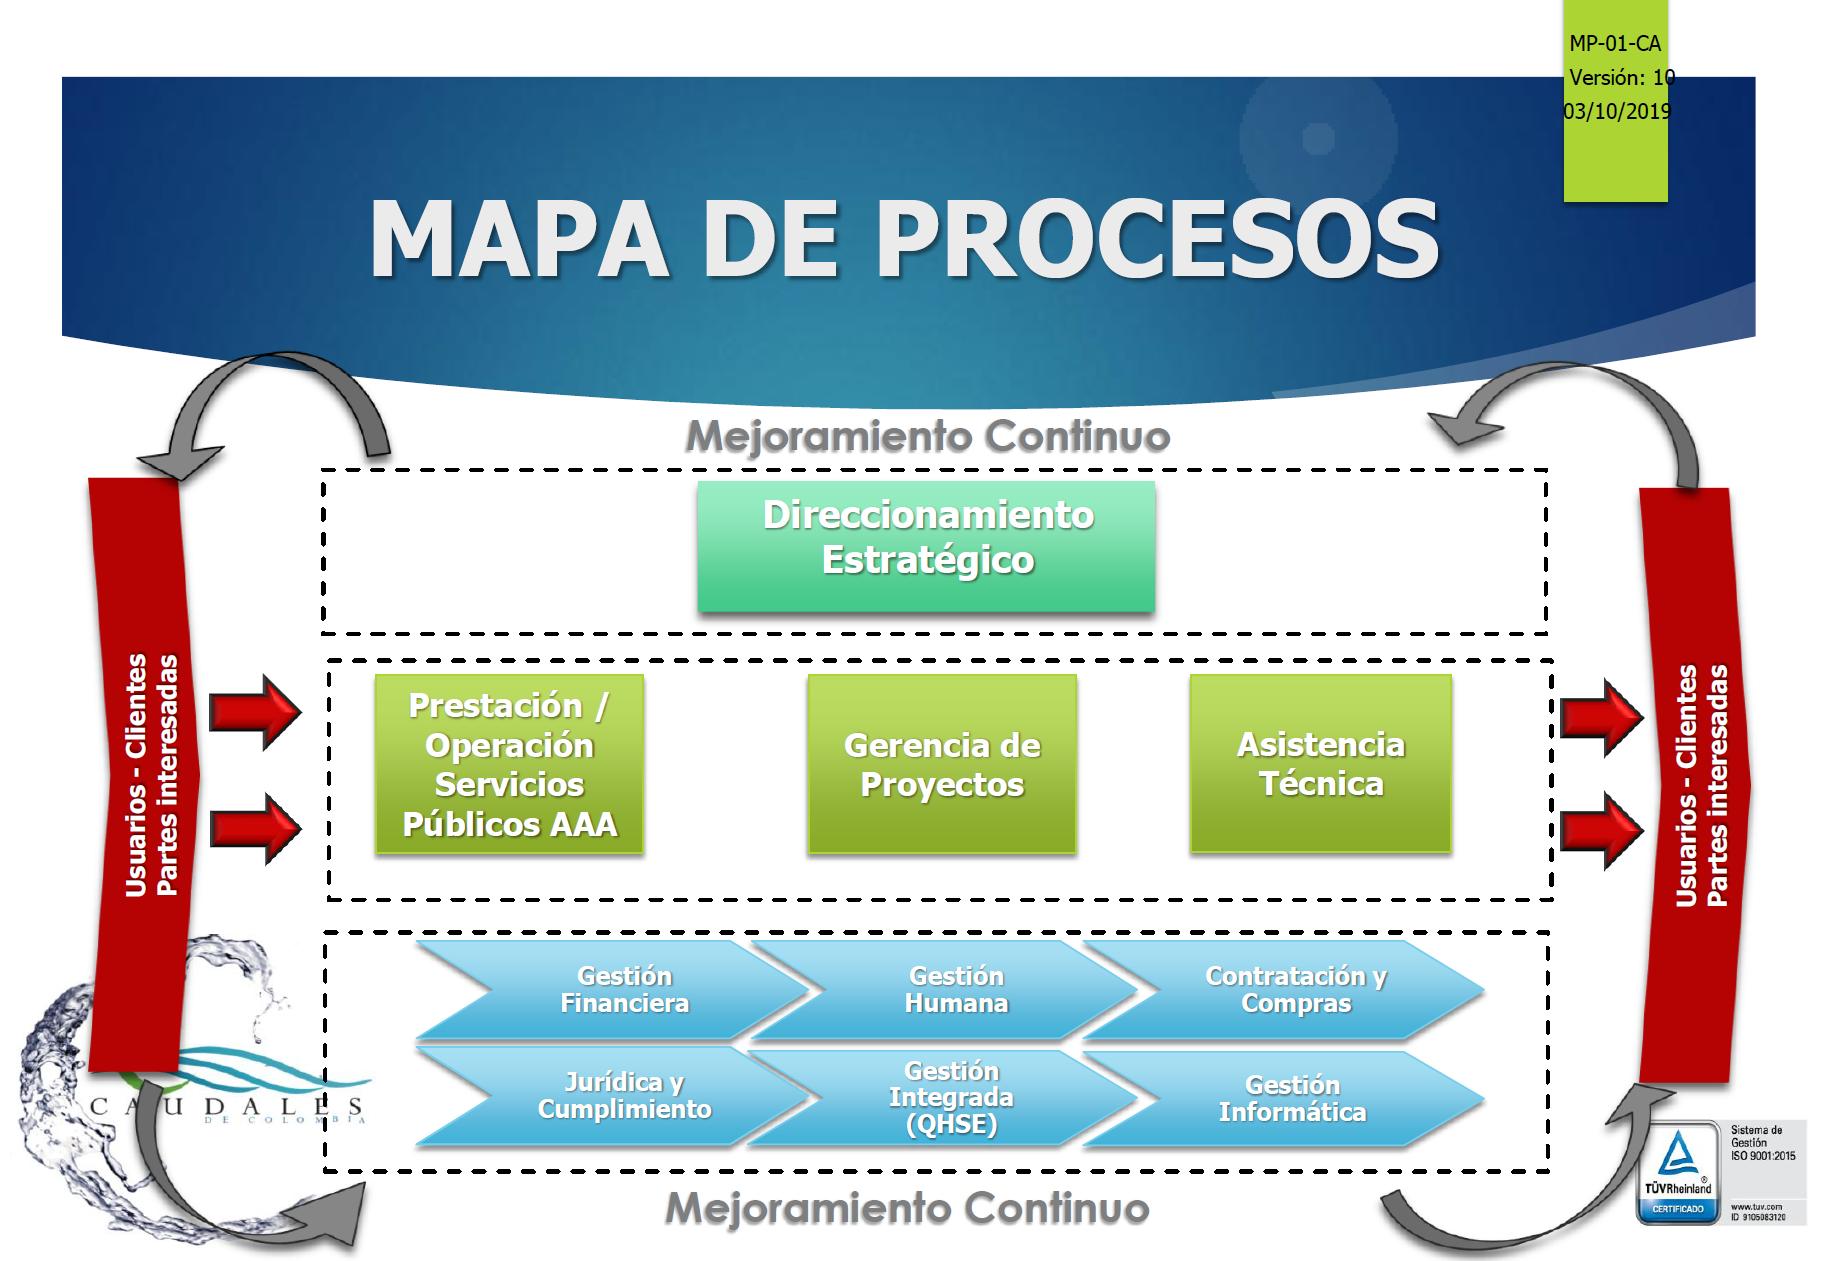 MP-01-CA MAPA DE PROCESOS. V10